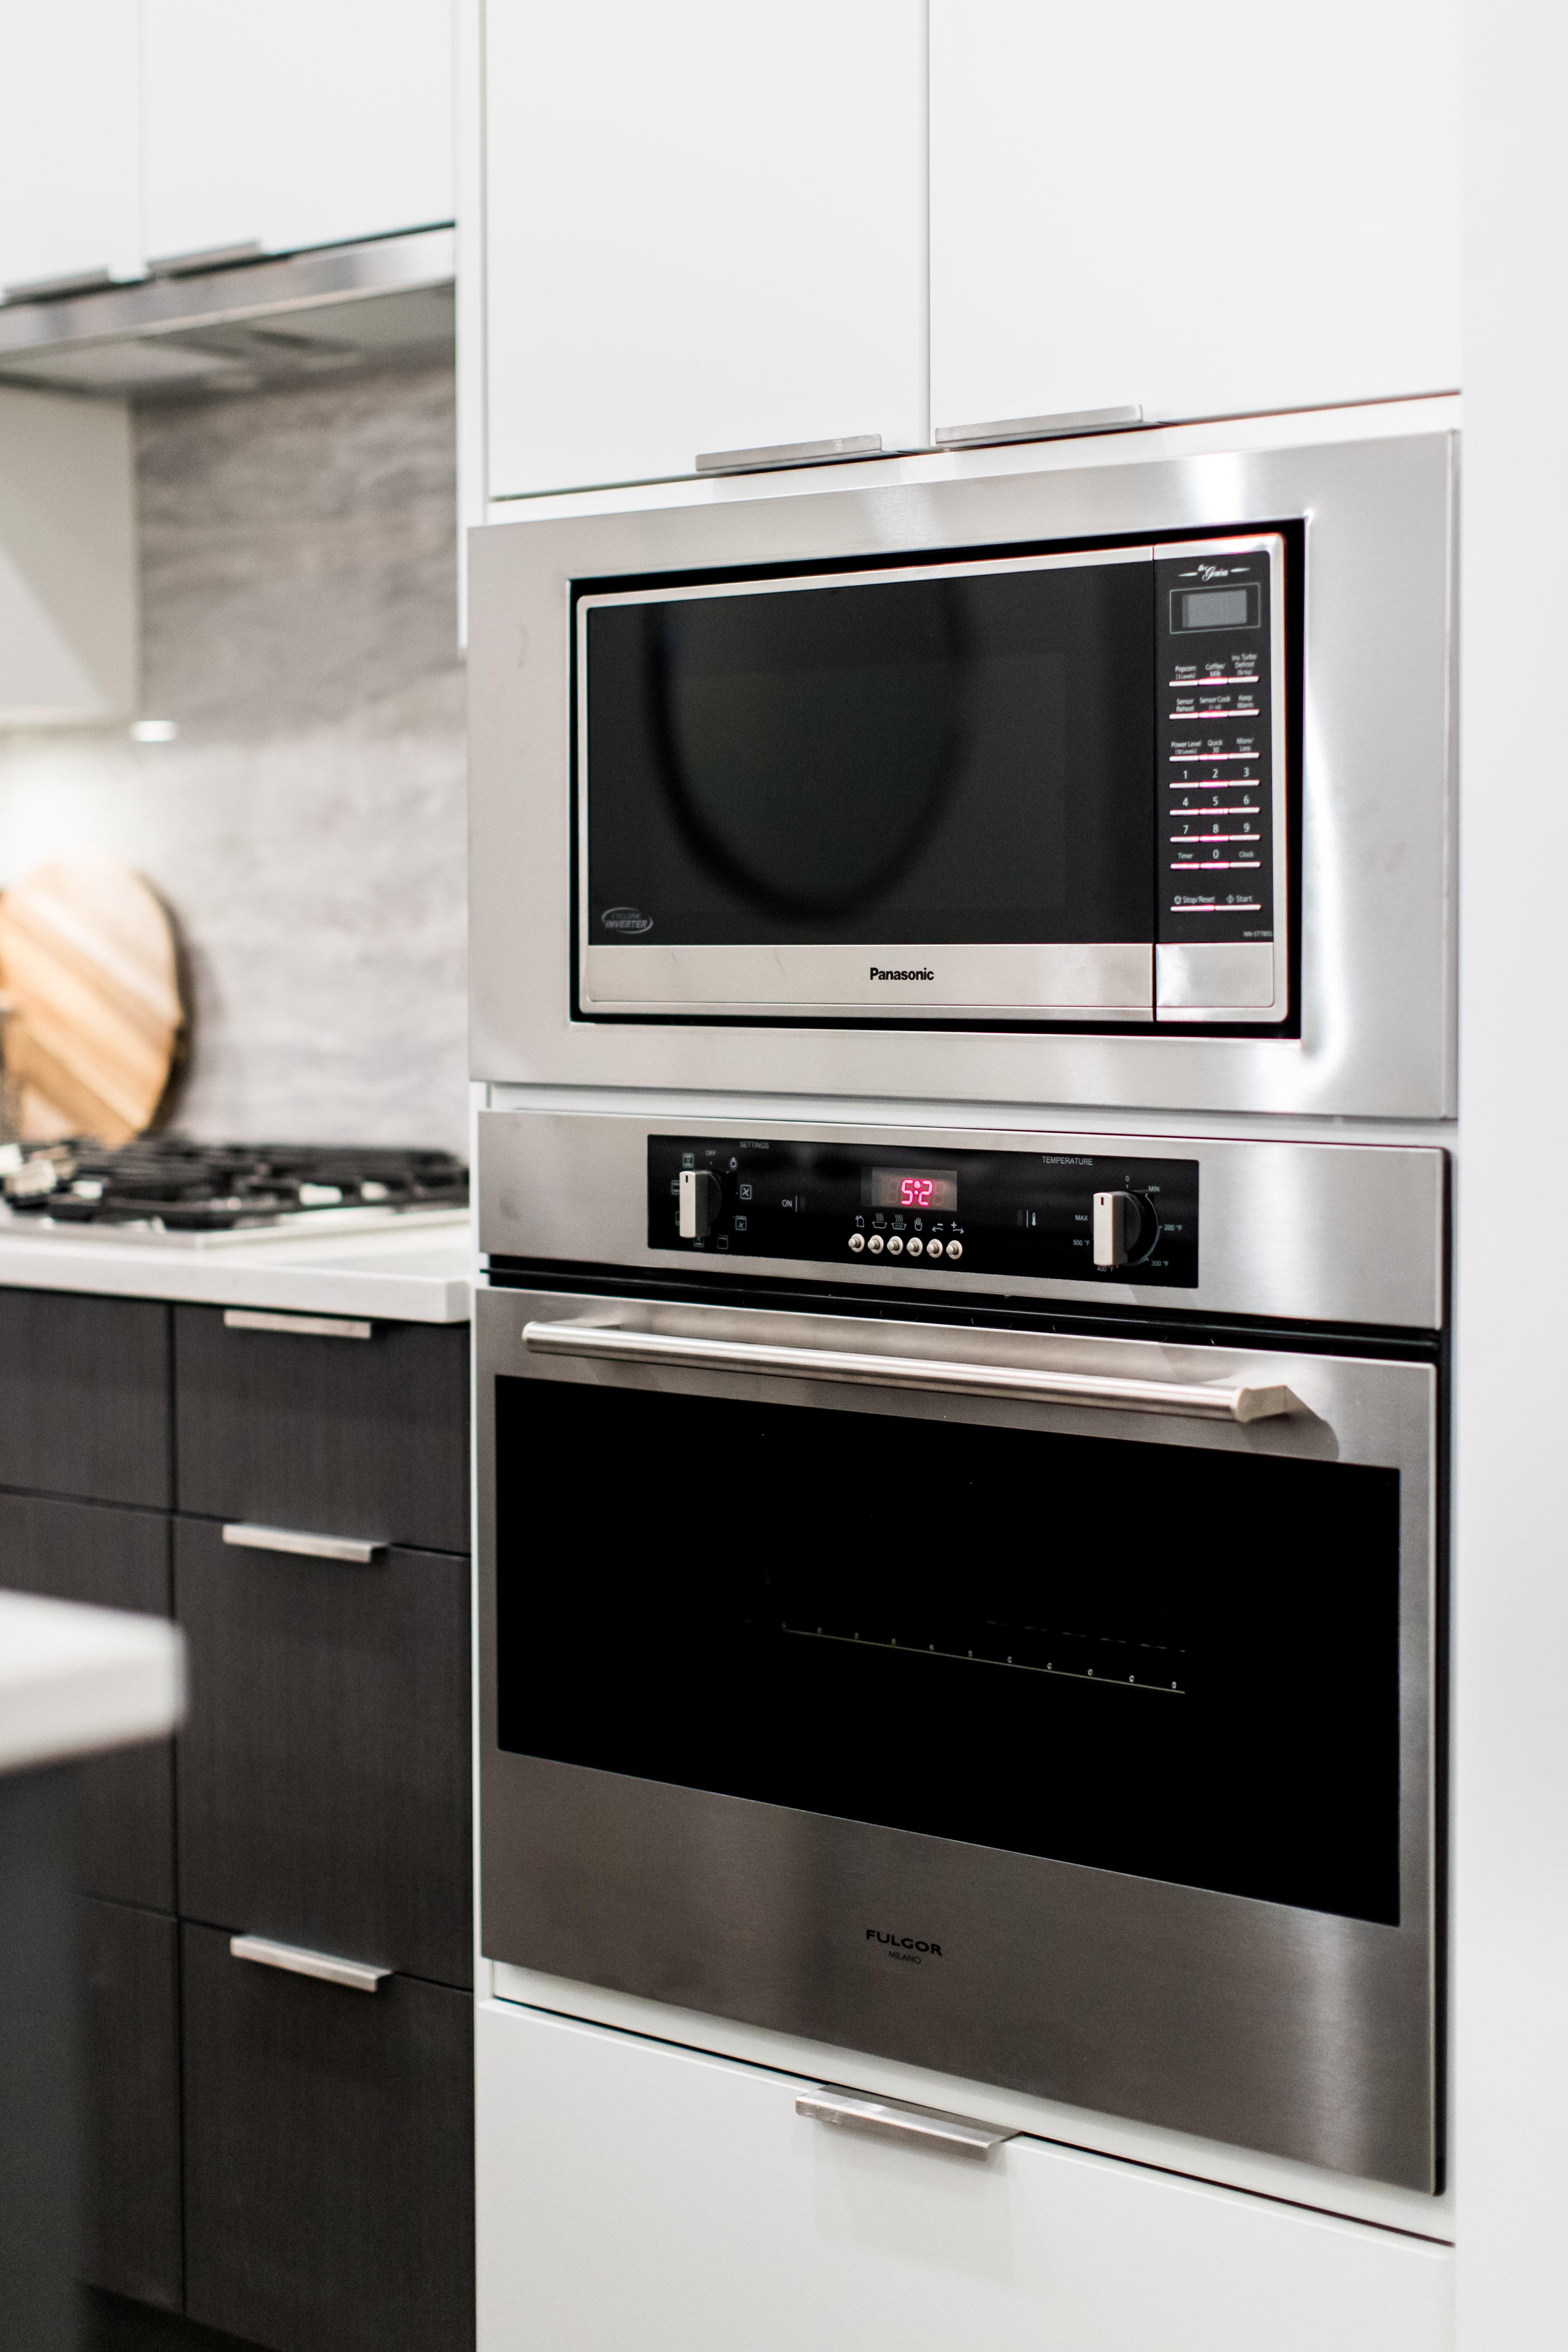 https://highpointeliving.ca/wp-content/uploads/2019/08/Kitchen-A45I0094.jpg